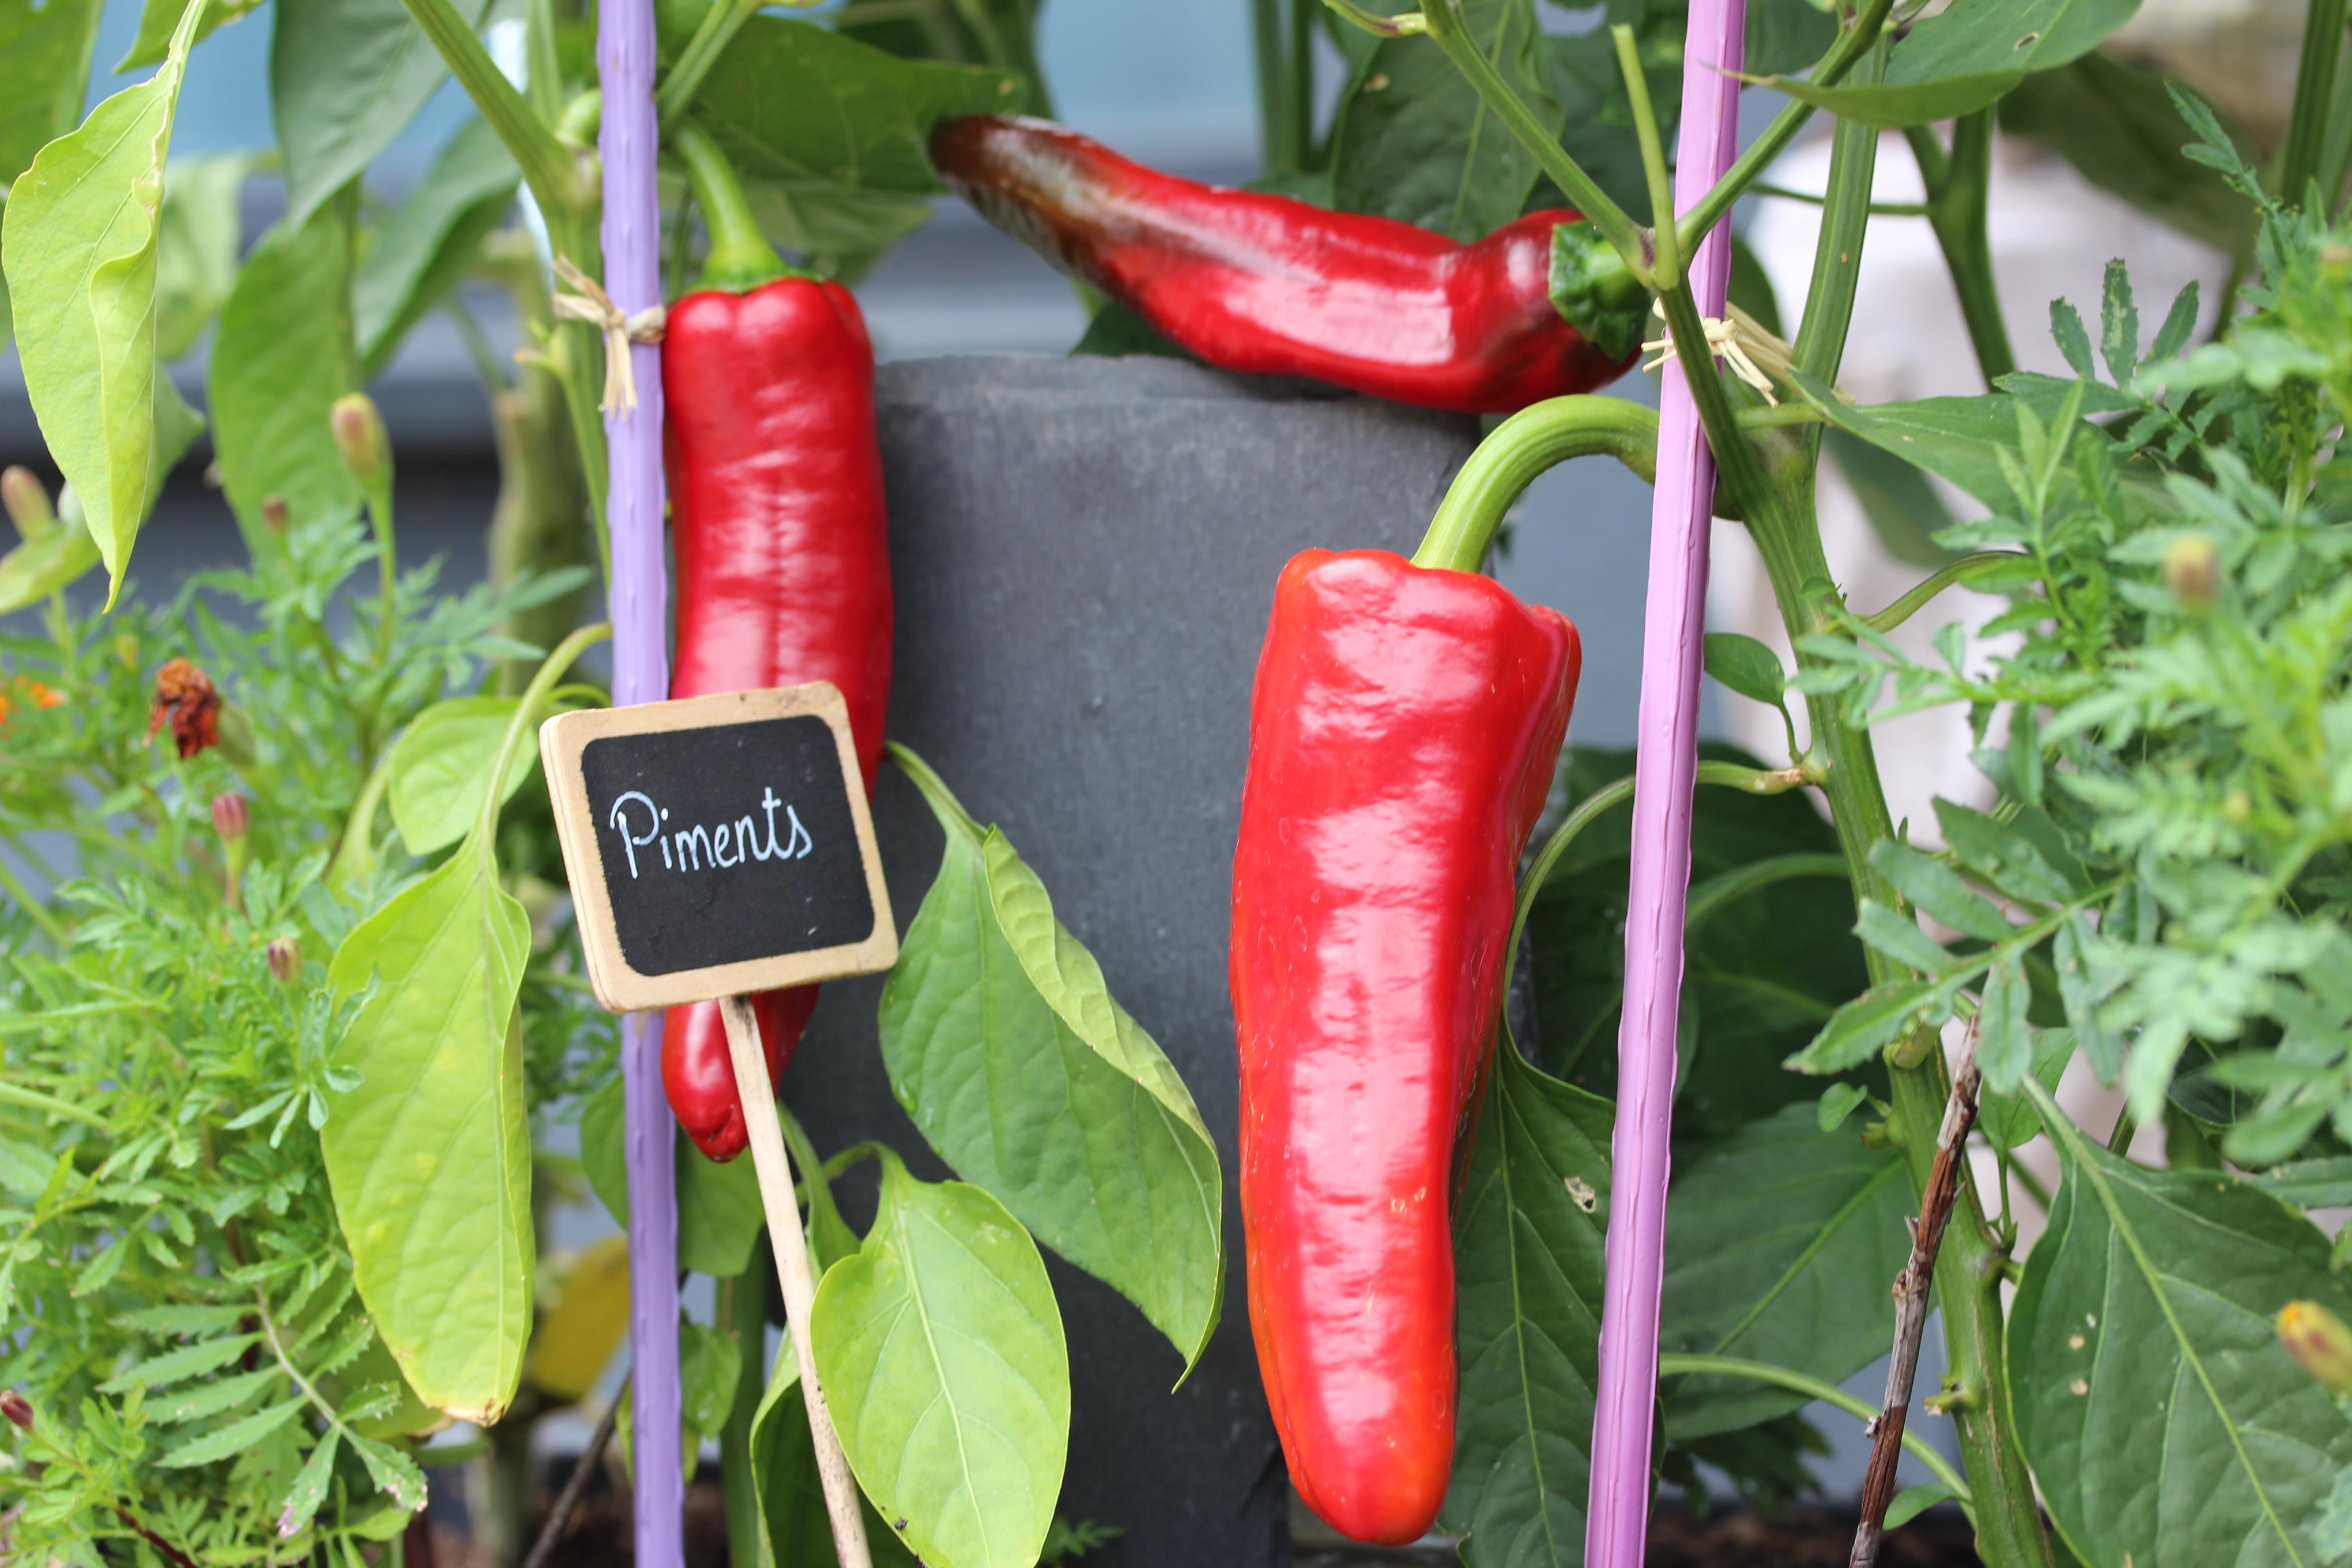 Piments-blog-delbard-jardin-potager